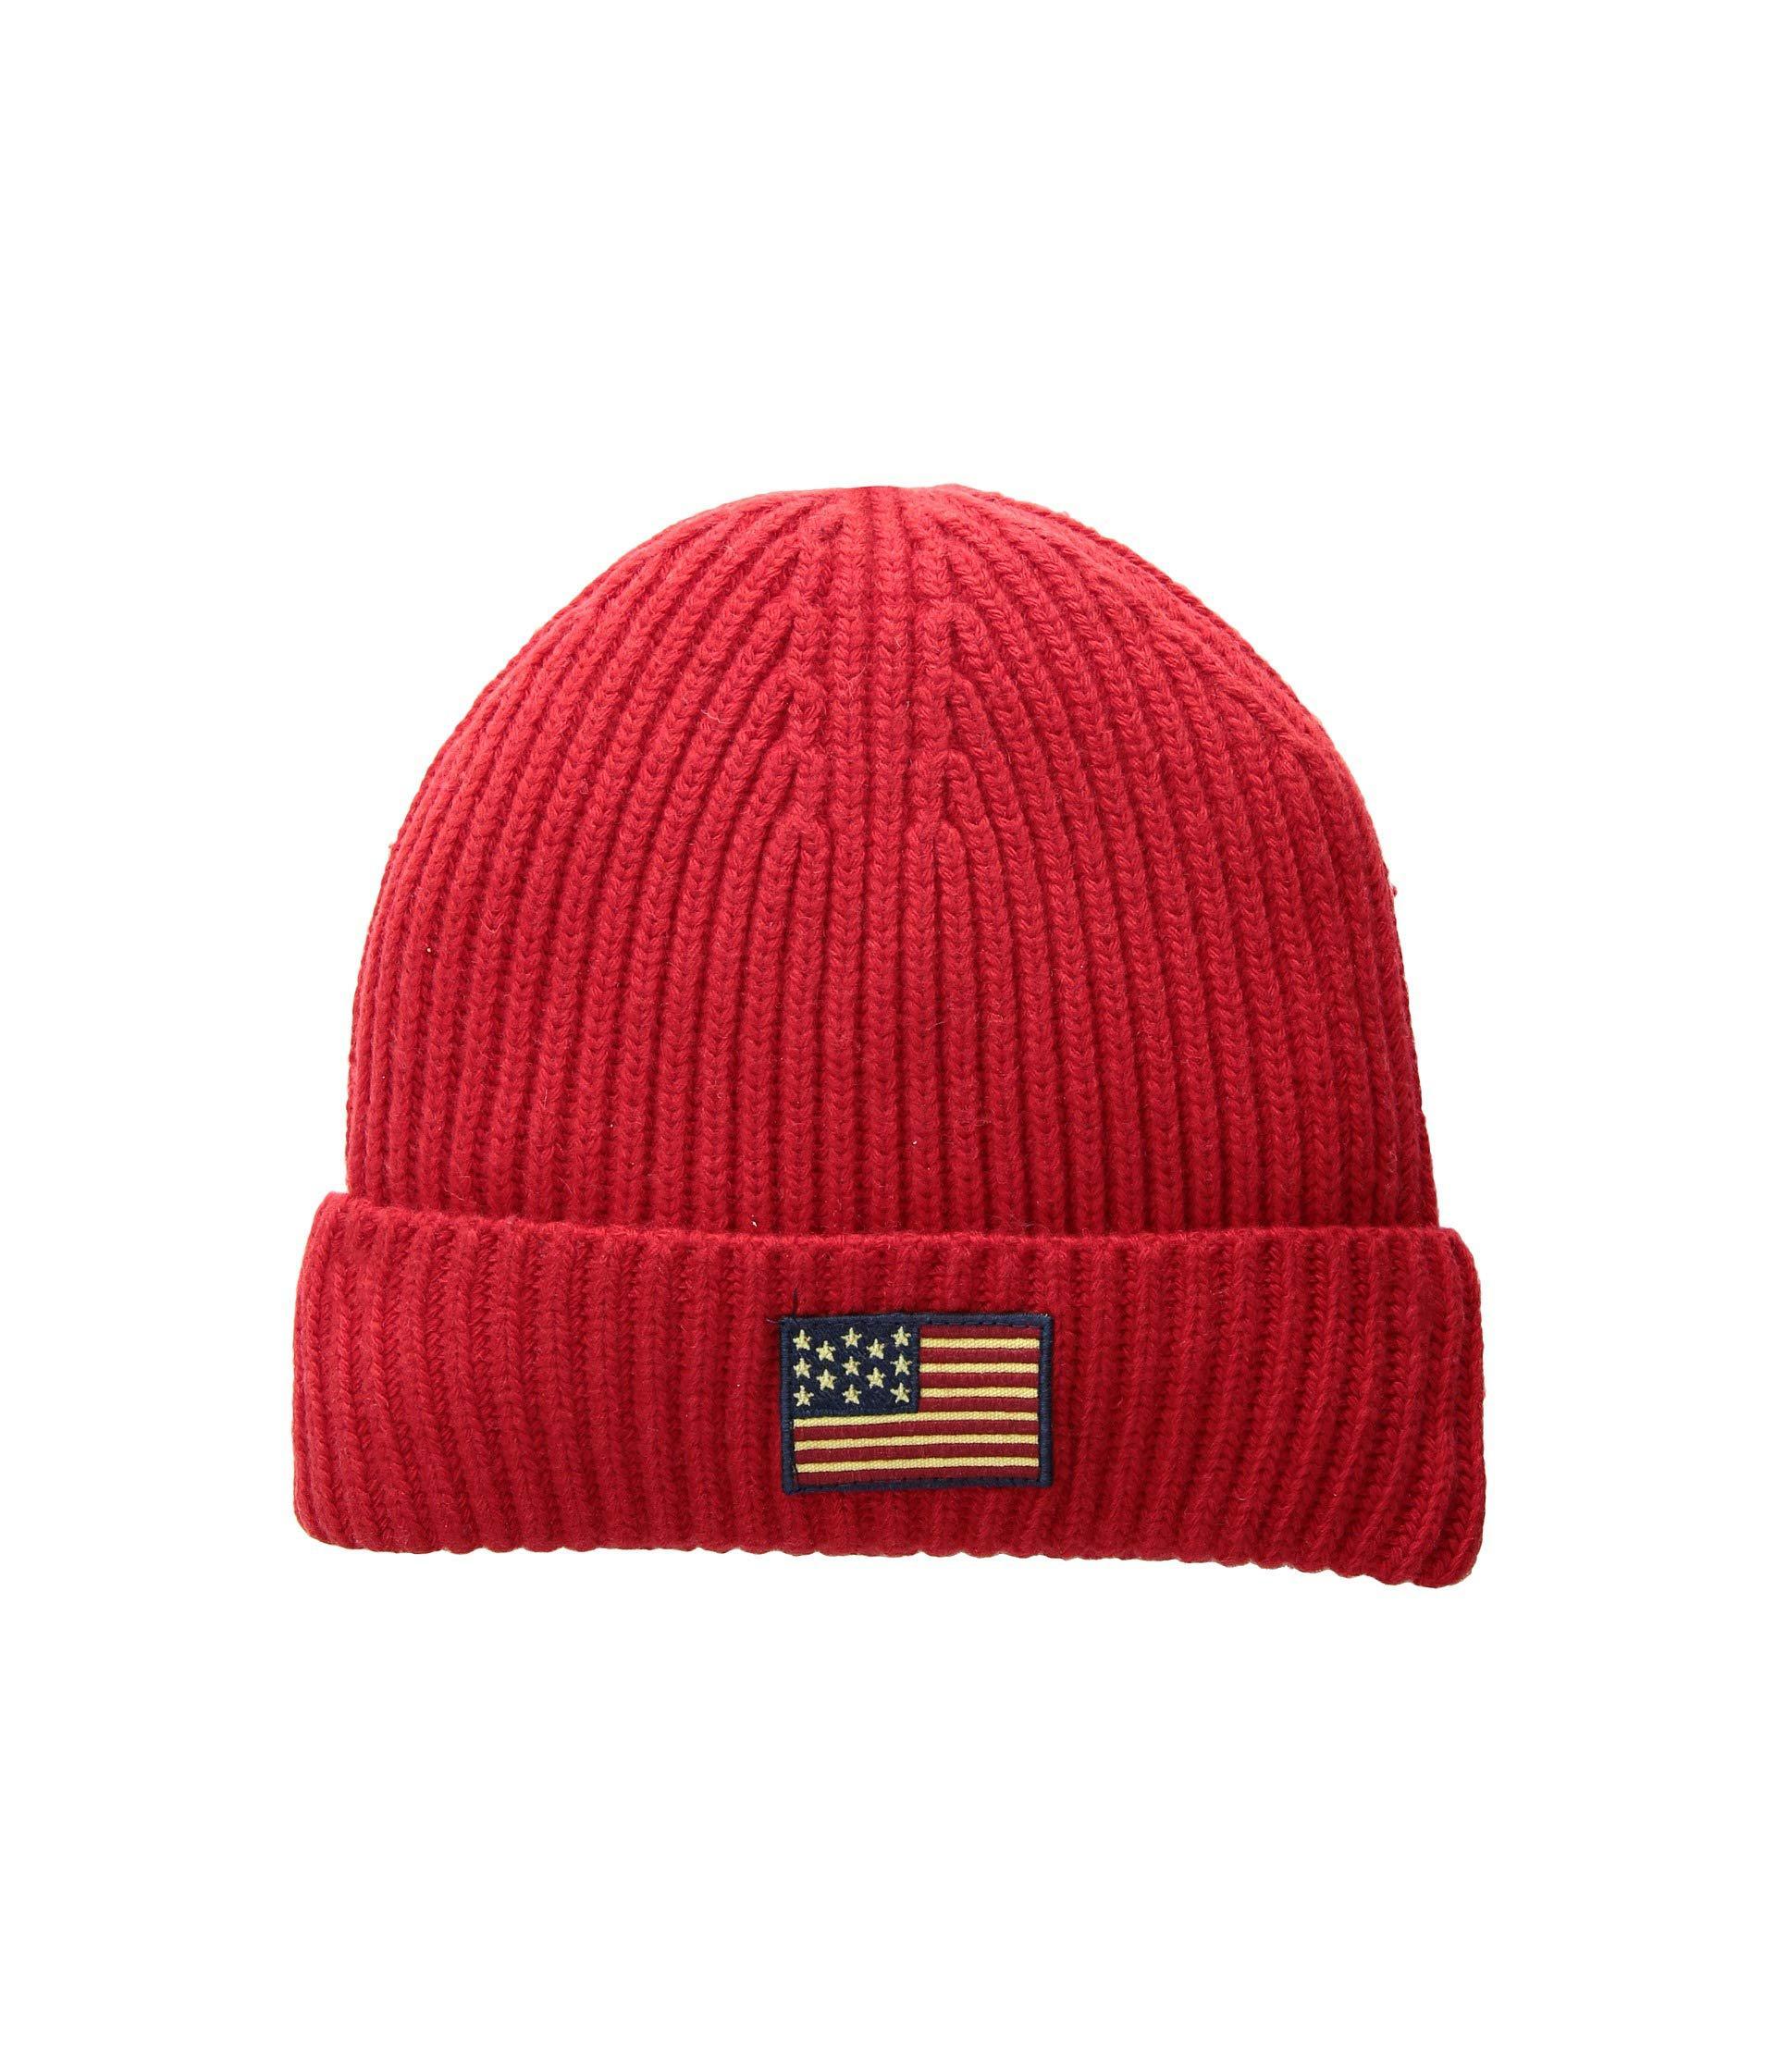 Lyst - Polo Ralph Lauren American Flag Cuff Hat (rl 2000 Red) Caps ... 09148fdb08ad